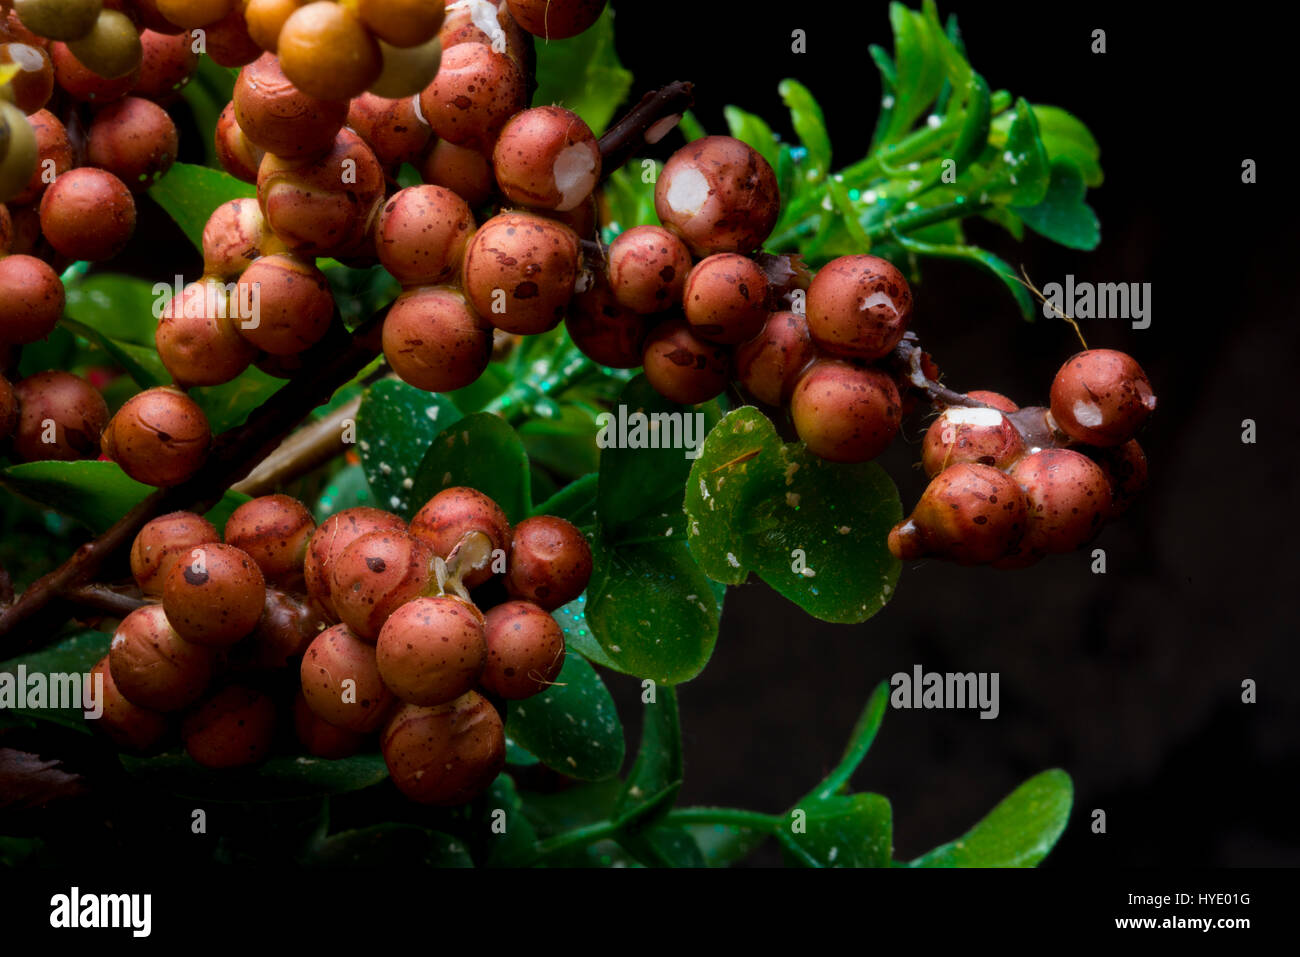 decorative floral picks berries - Stock Image